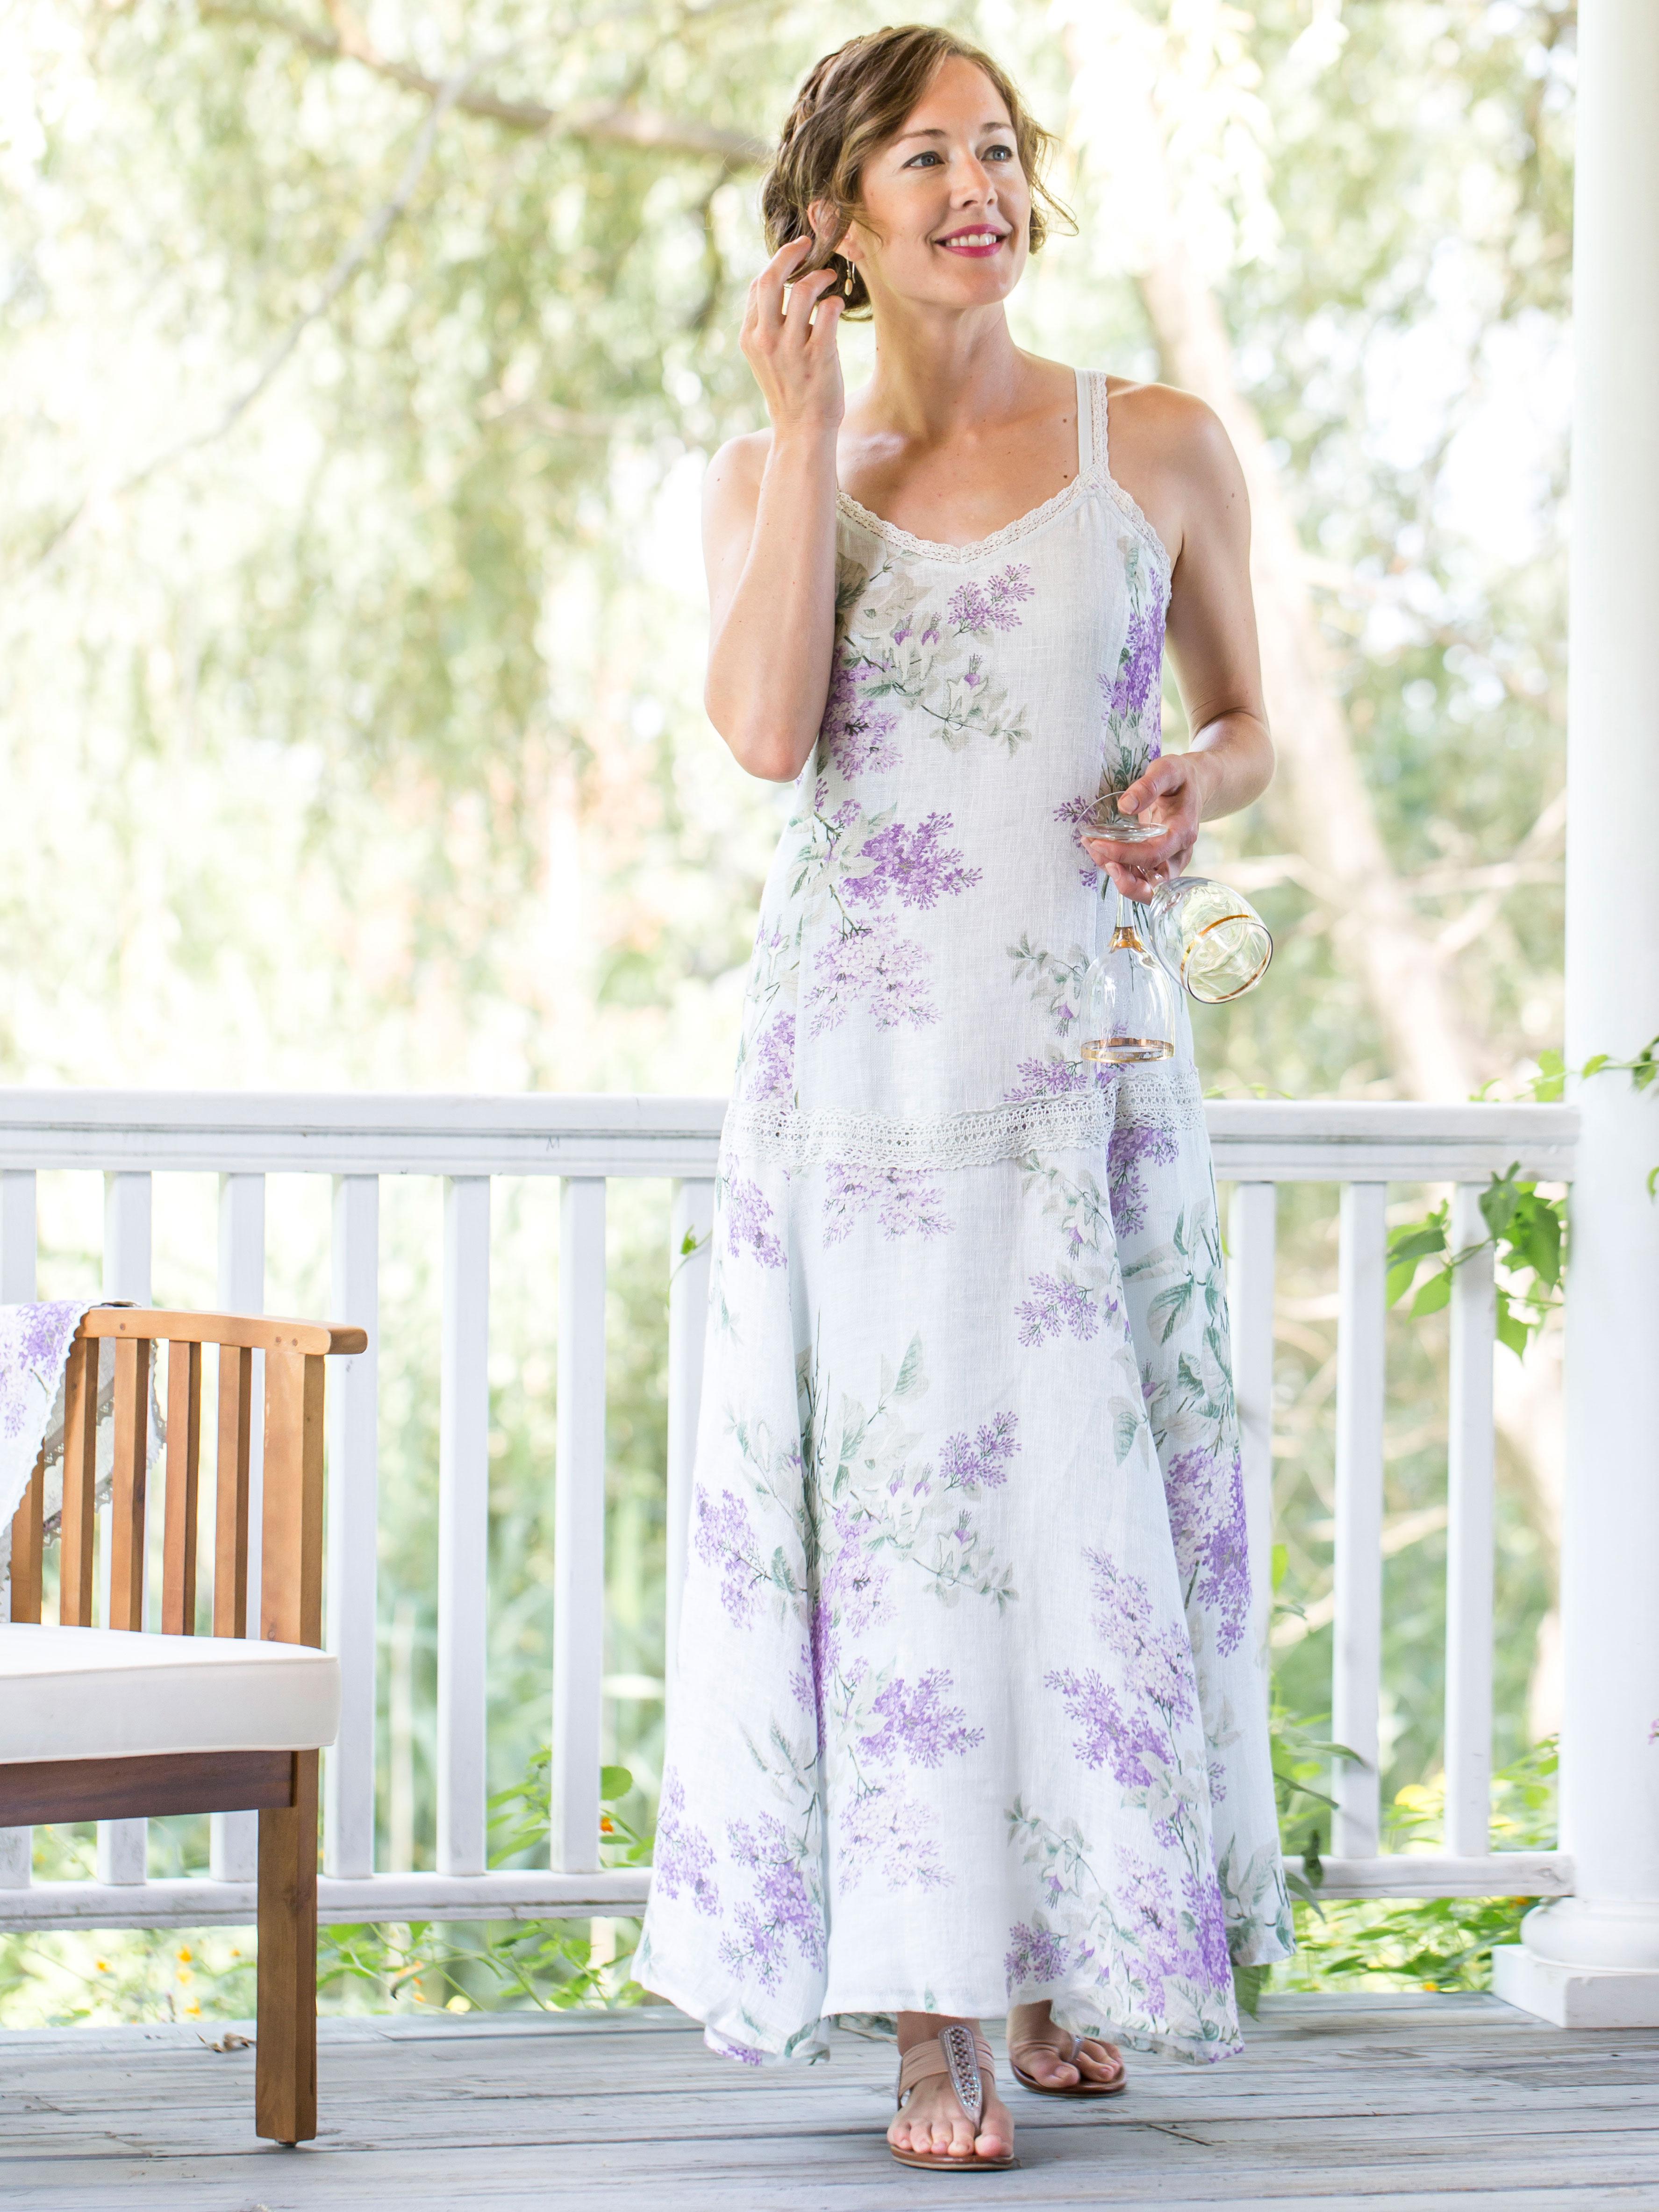 Lilac Linen Dress | Attic Sale, Ladies Attic :Beautiful Designs by ...